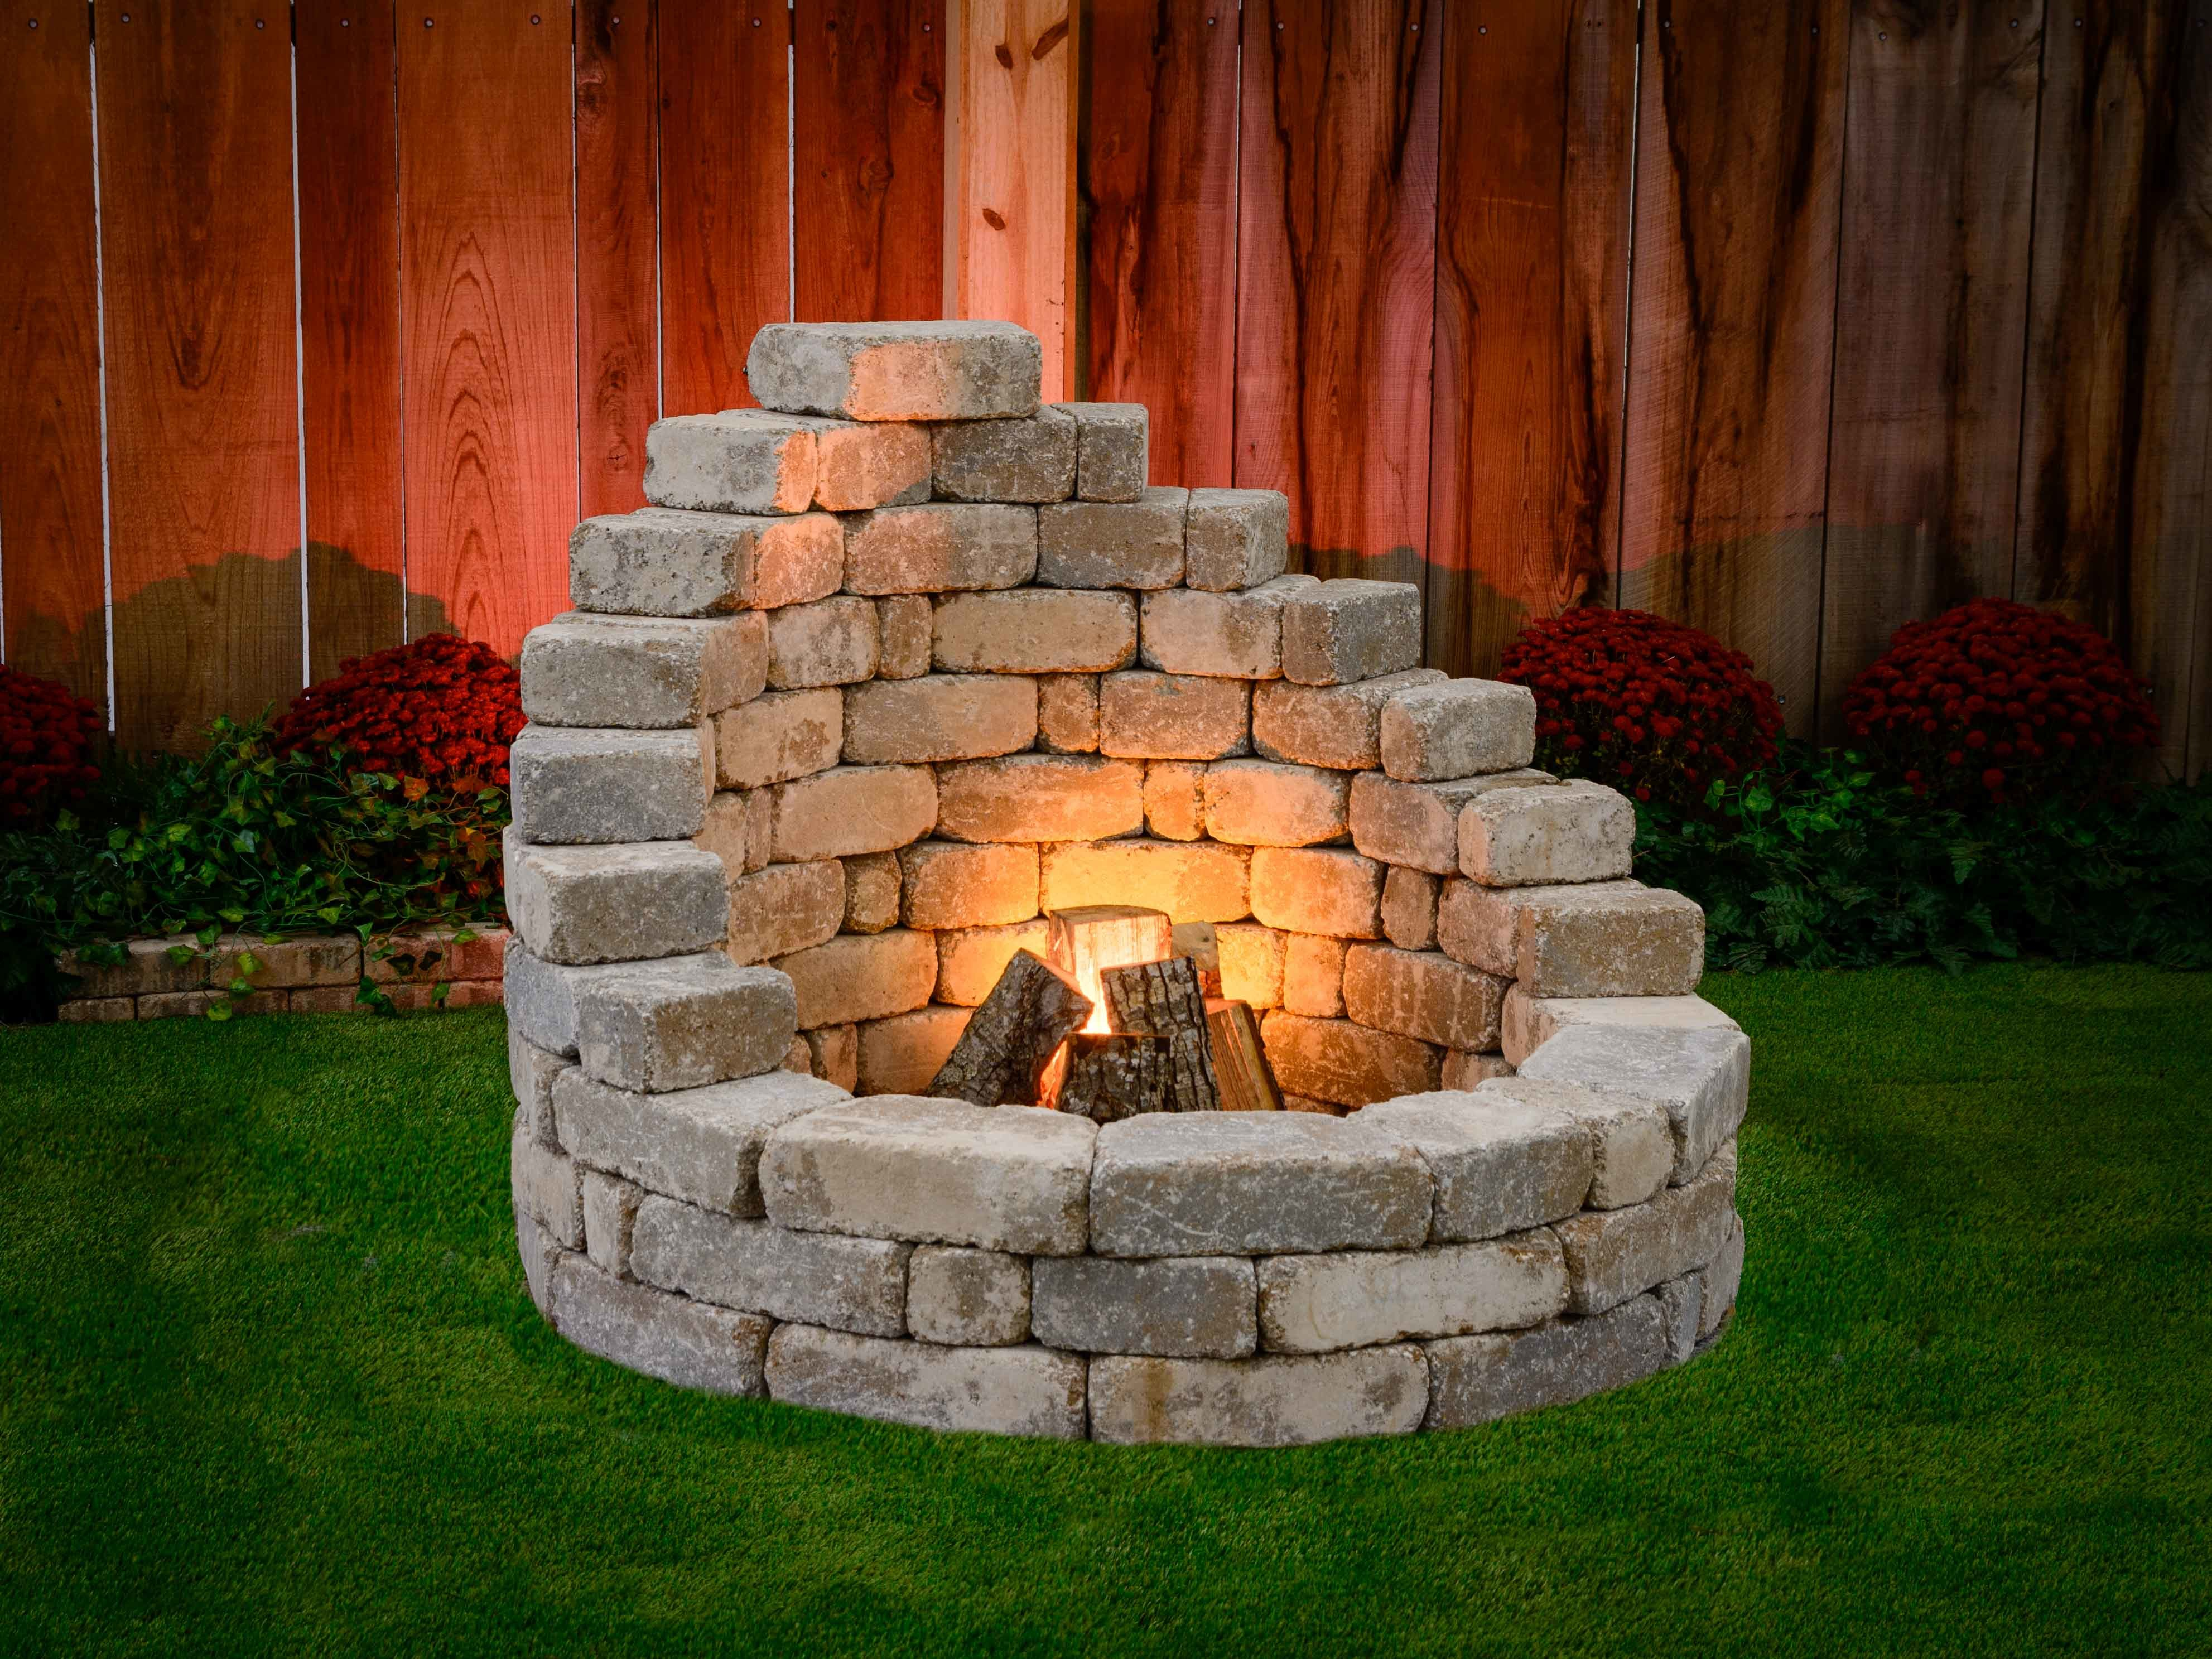 Fire Pit Kits | Shop Romanstone for impressive kits you ...